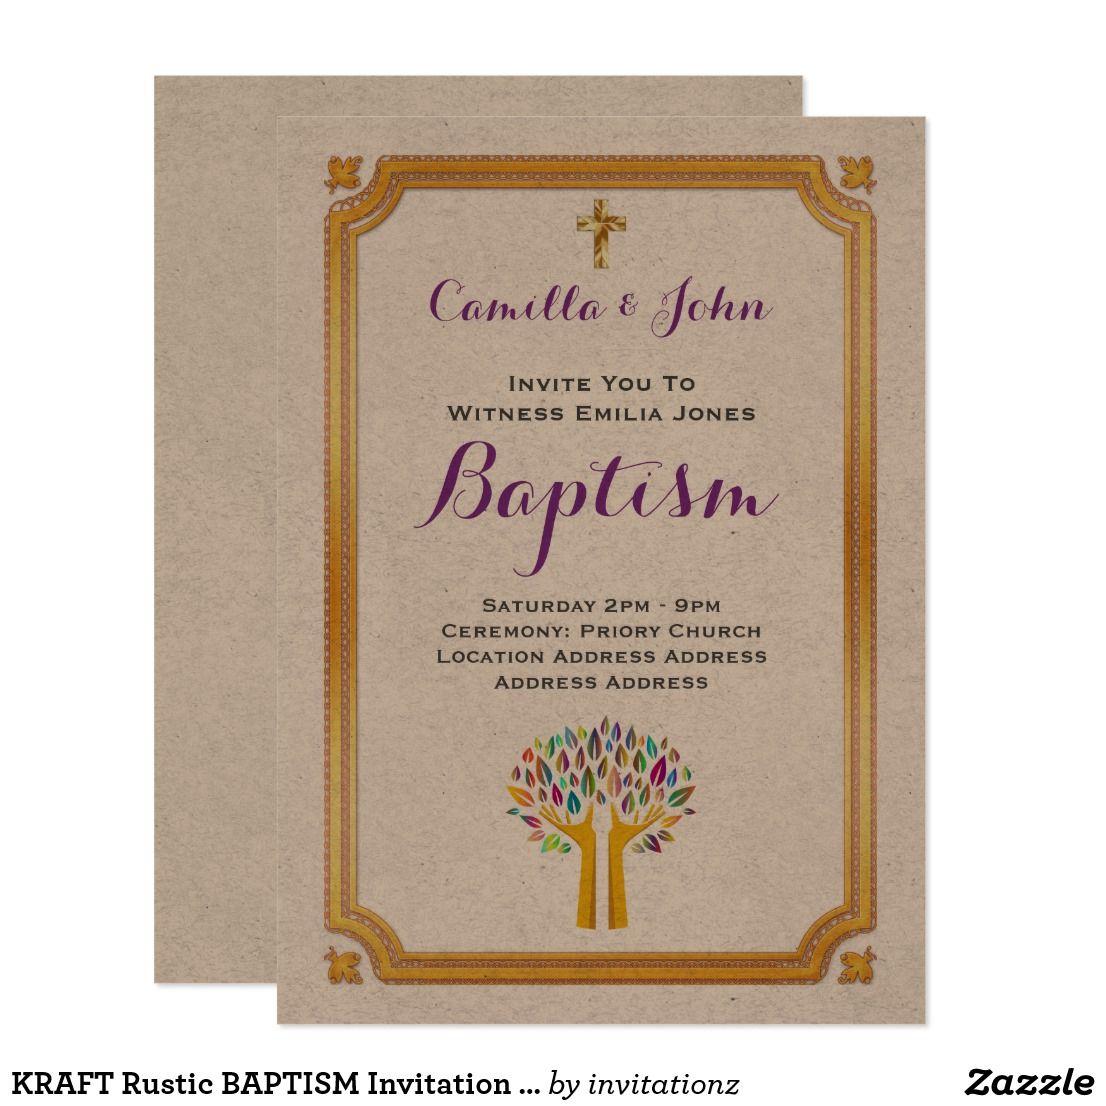 KRAFT Rustic BAPTISM Invitation Gold Tree Of Life